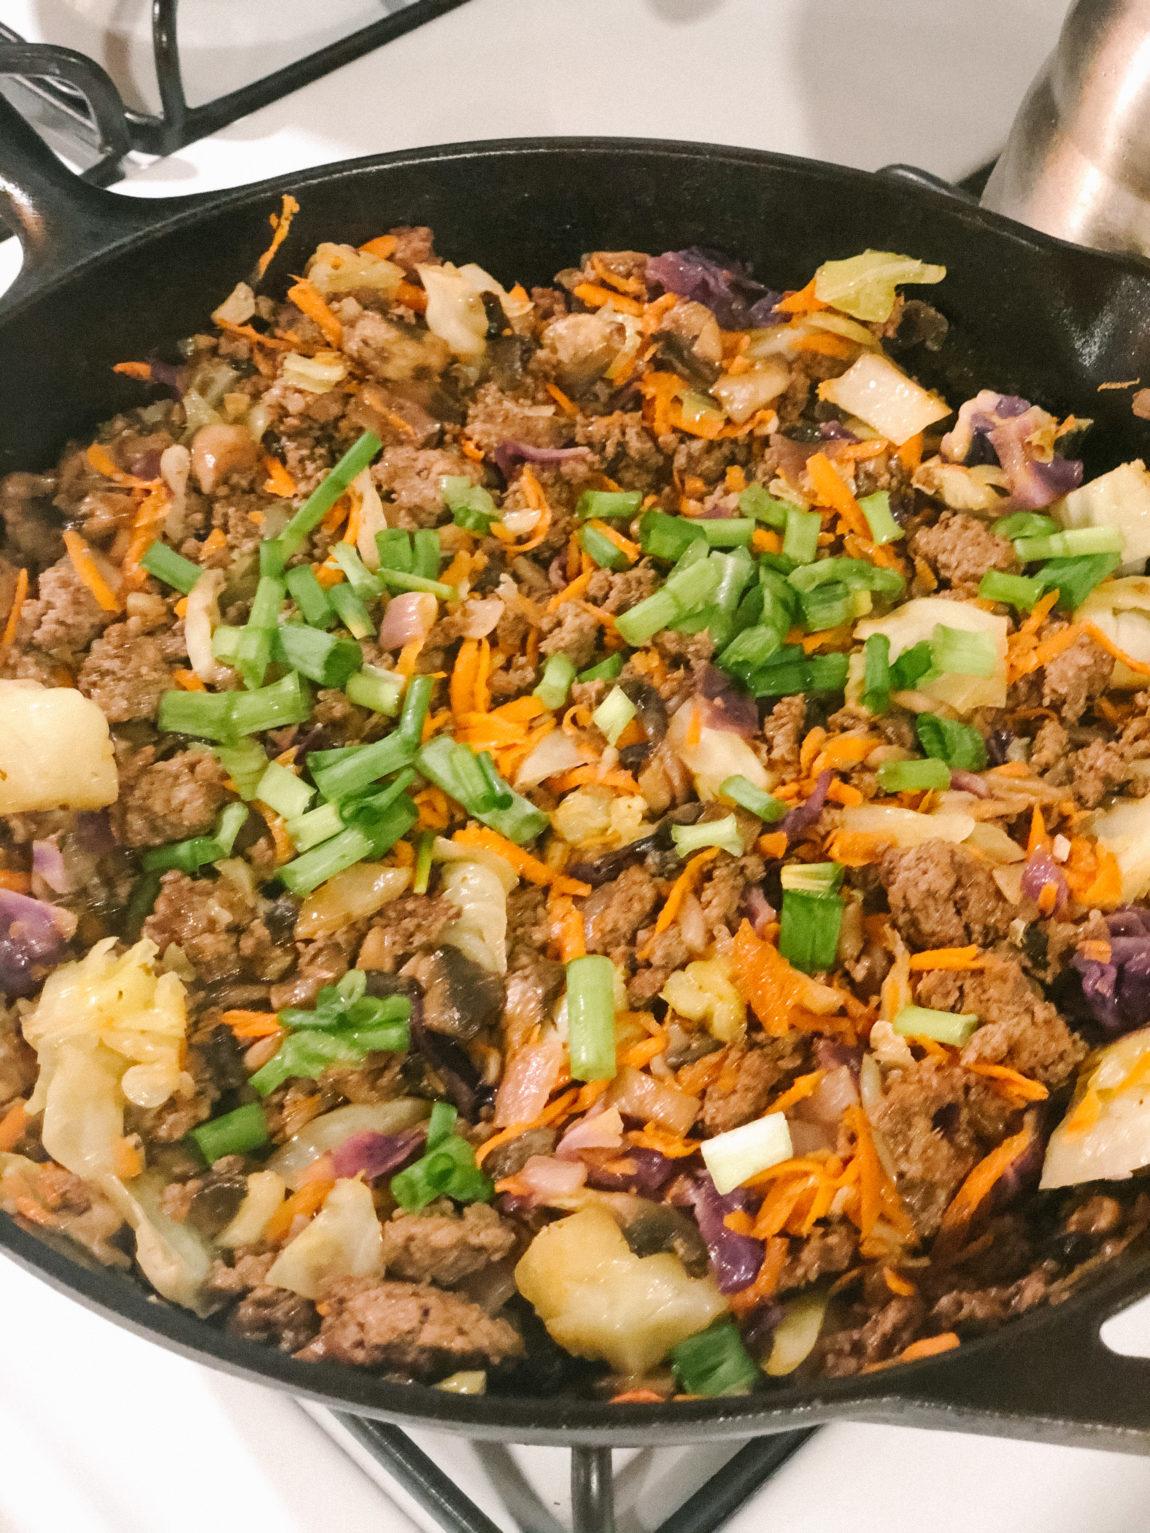 Ground Beef Stir-fry Bowls - Mikaela Lauren Wellness